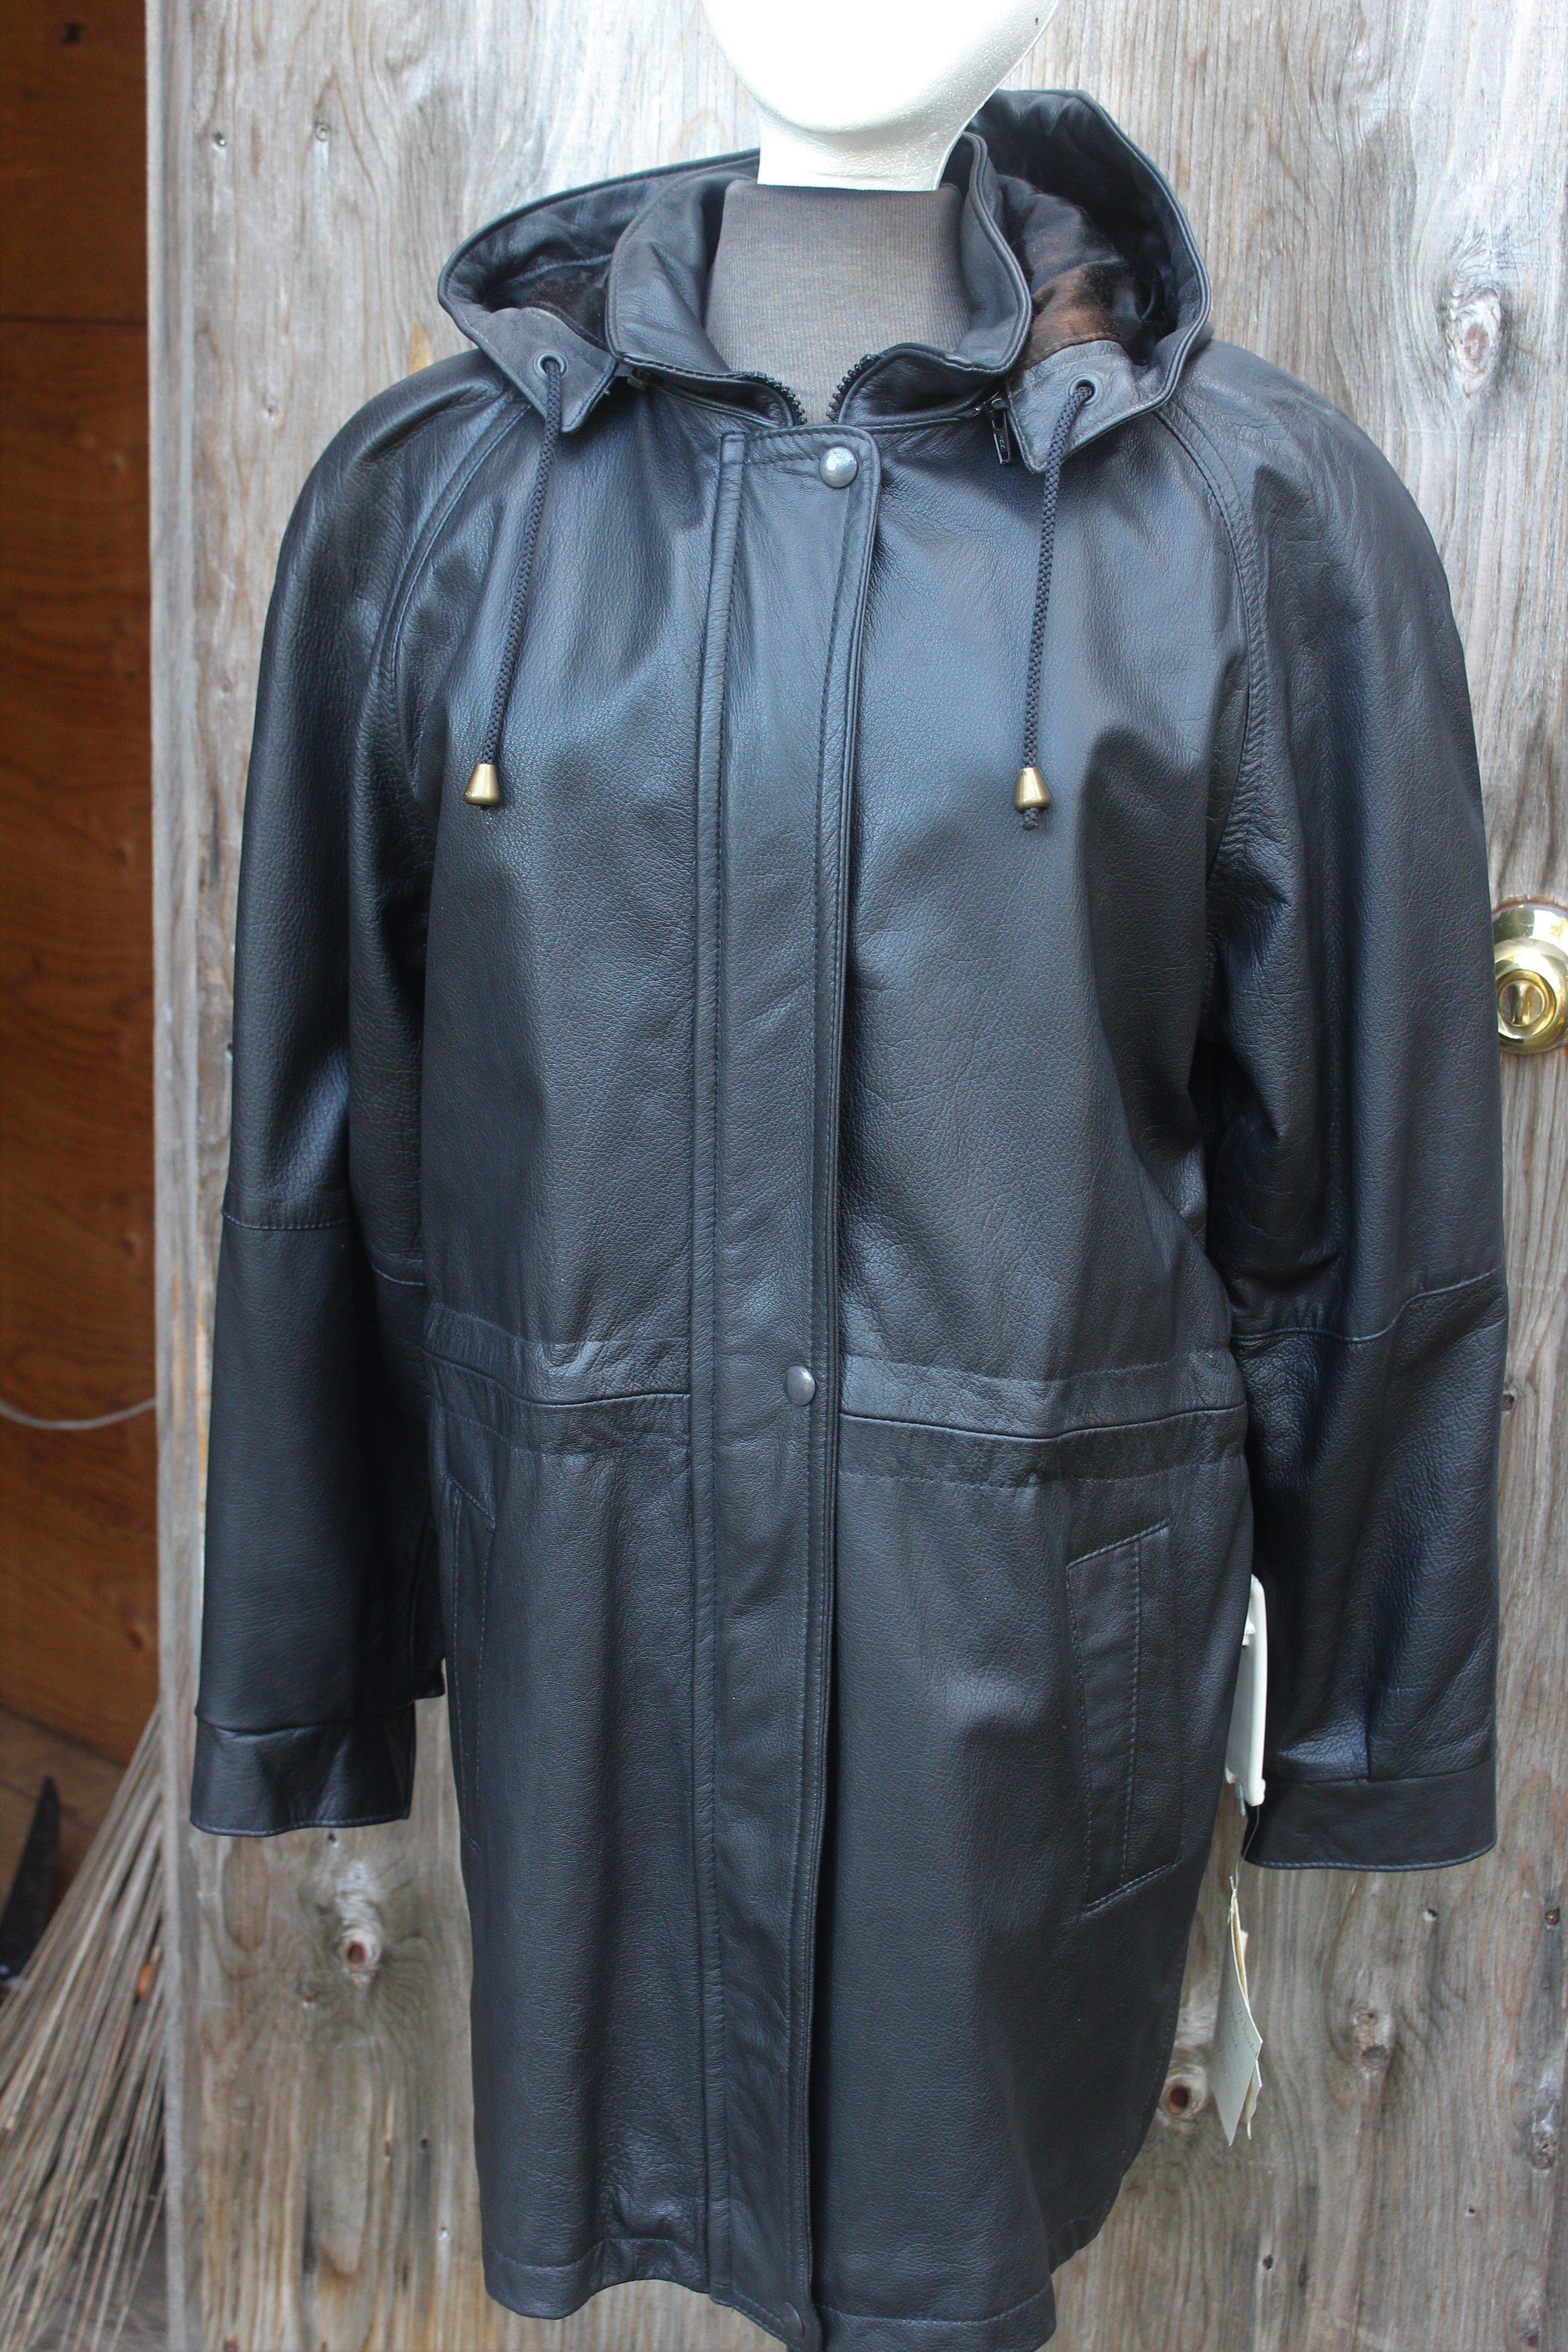 Black (Goat)- $439.95 Bainton's: Style #9608 G